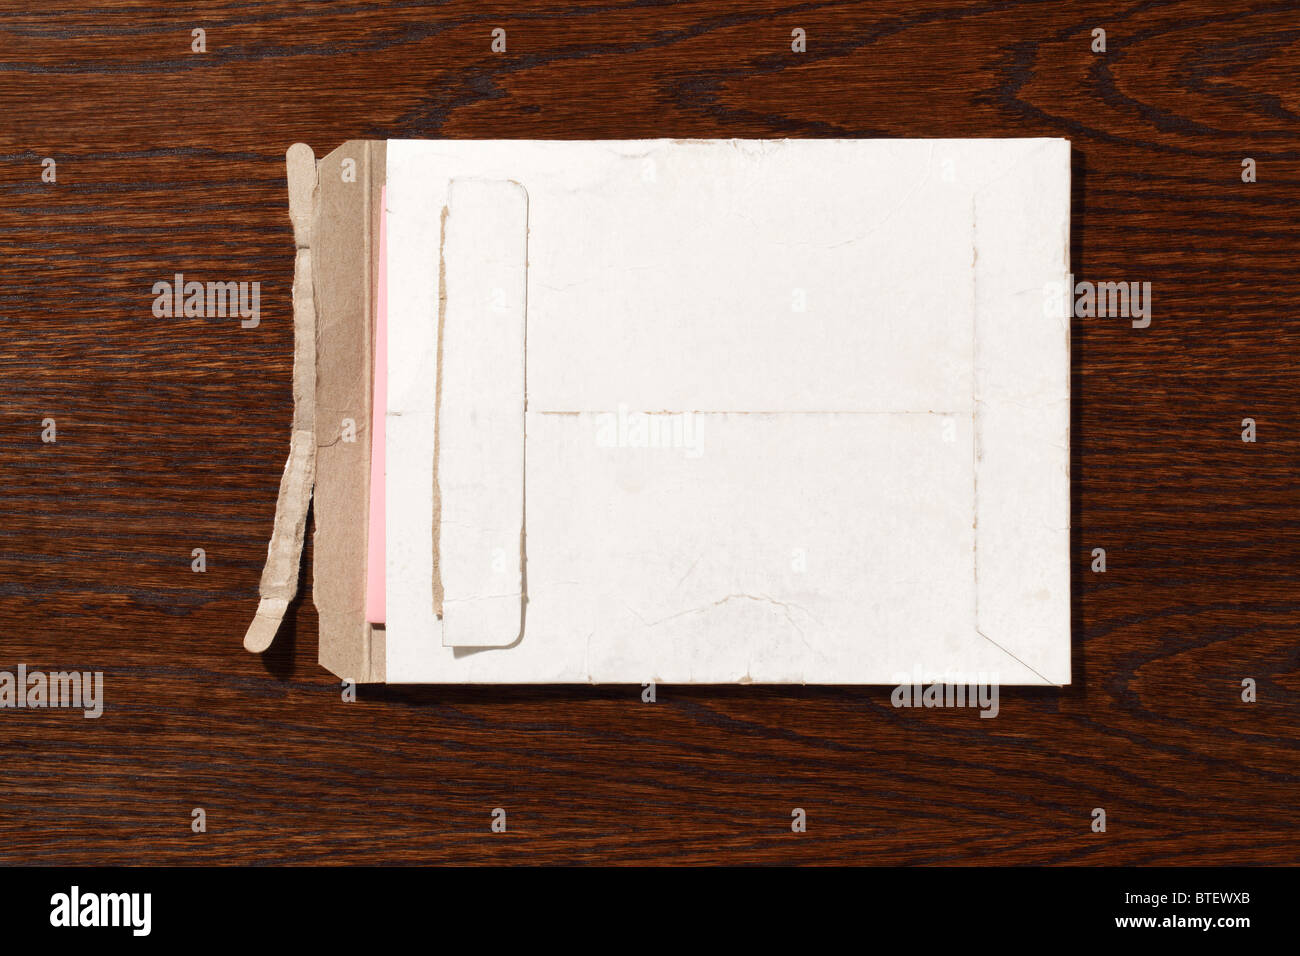 A used postal mailing envelope torn open. A dark brown wood desk background - Stock Image